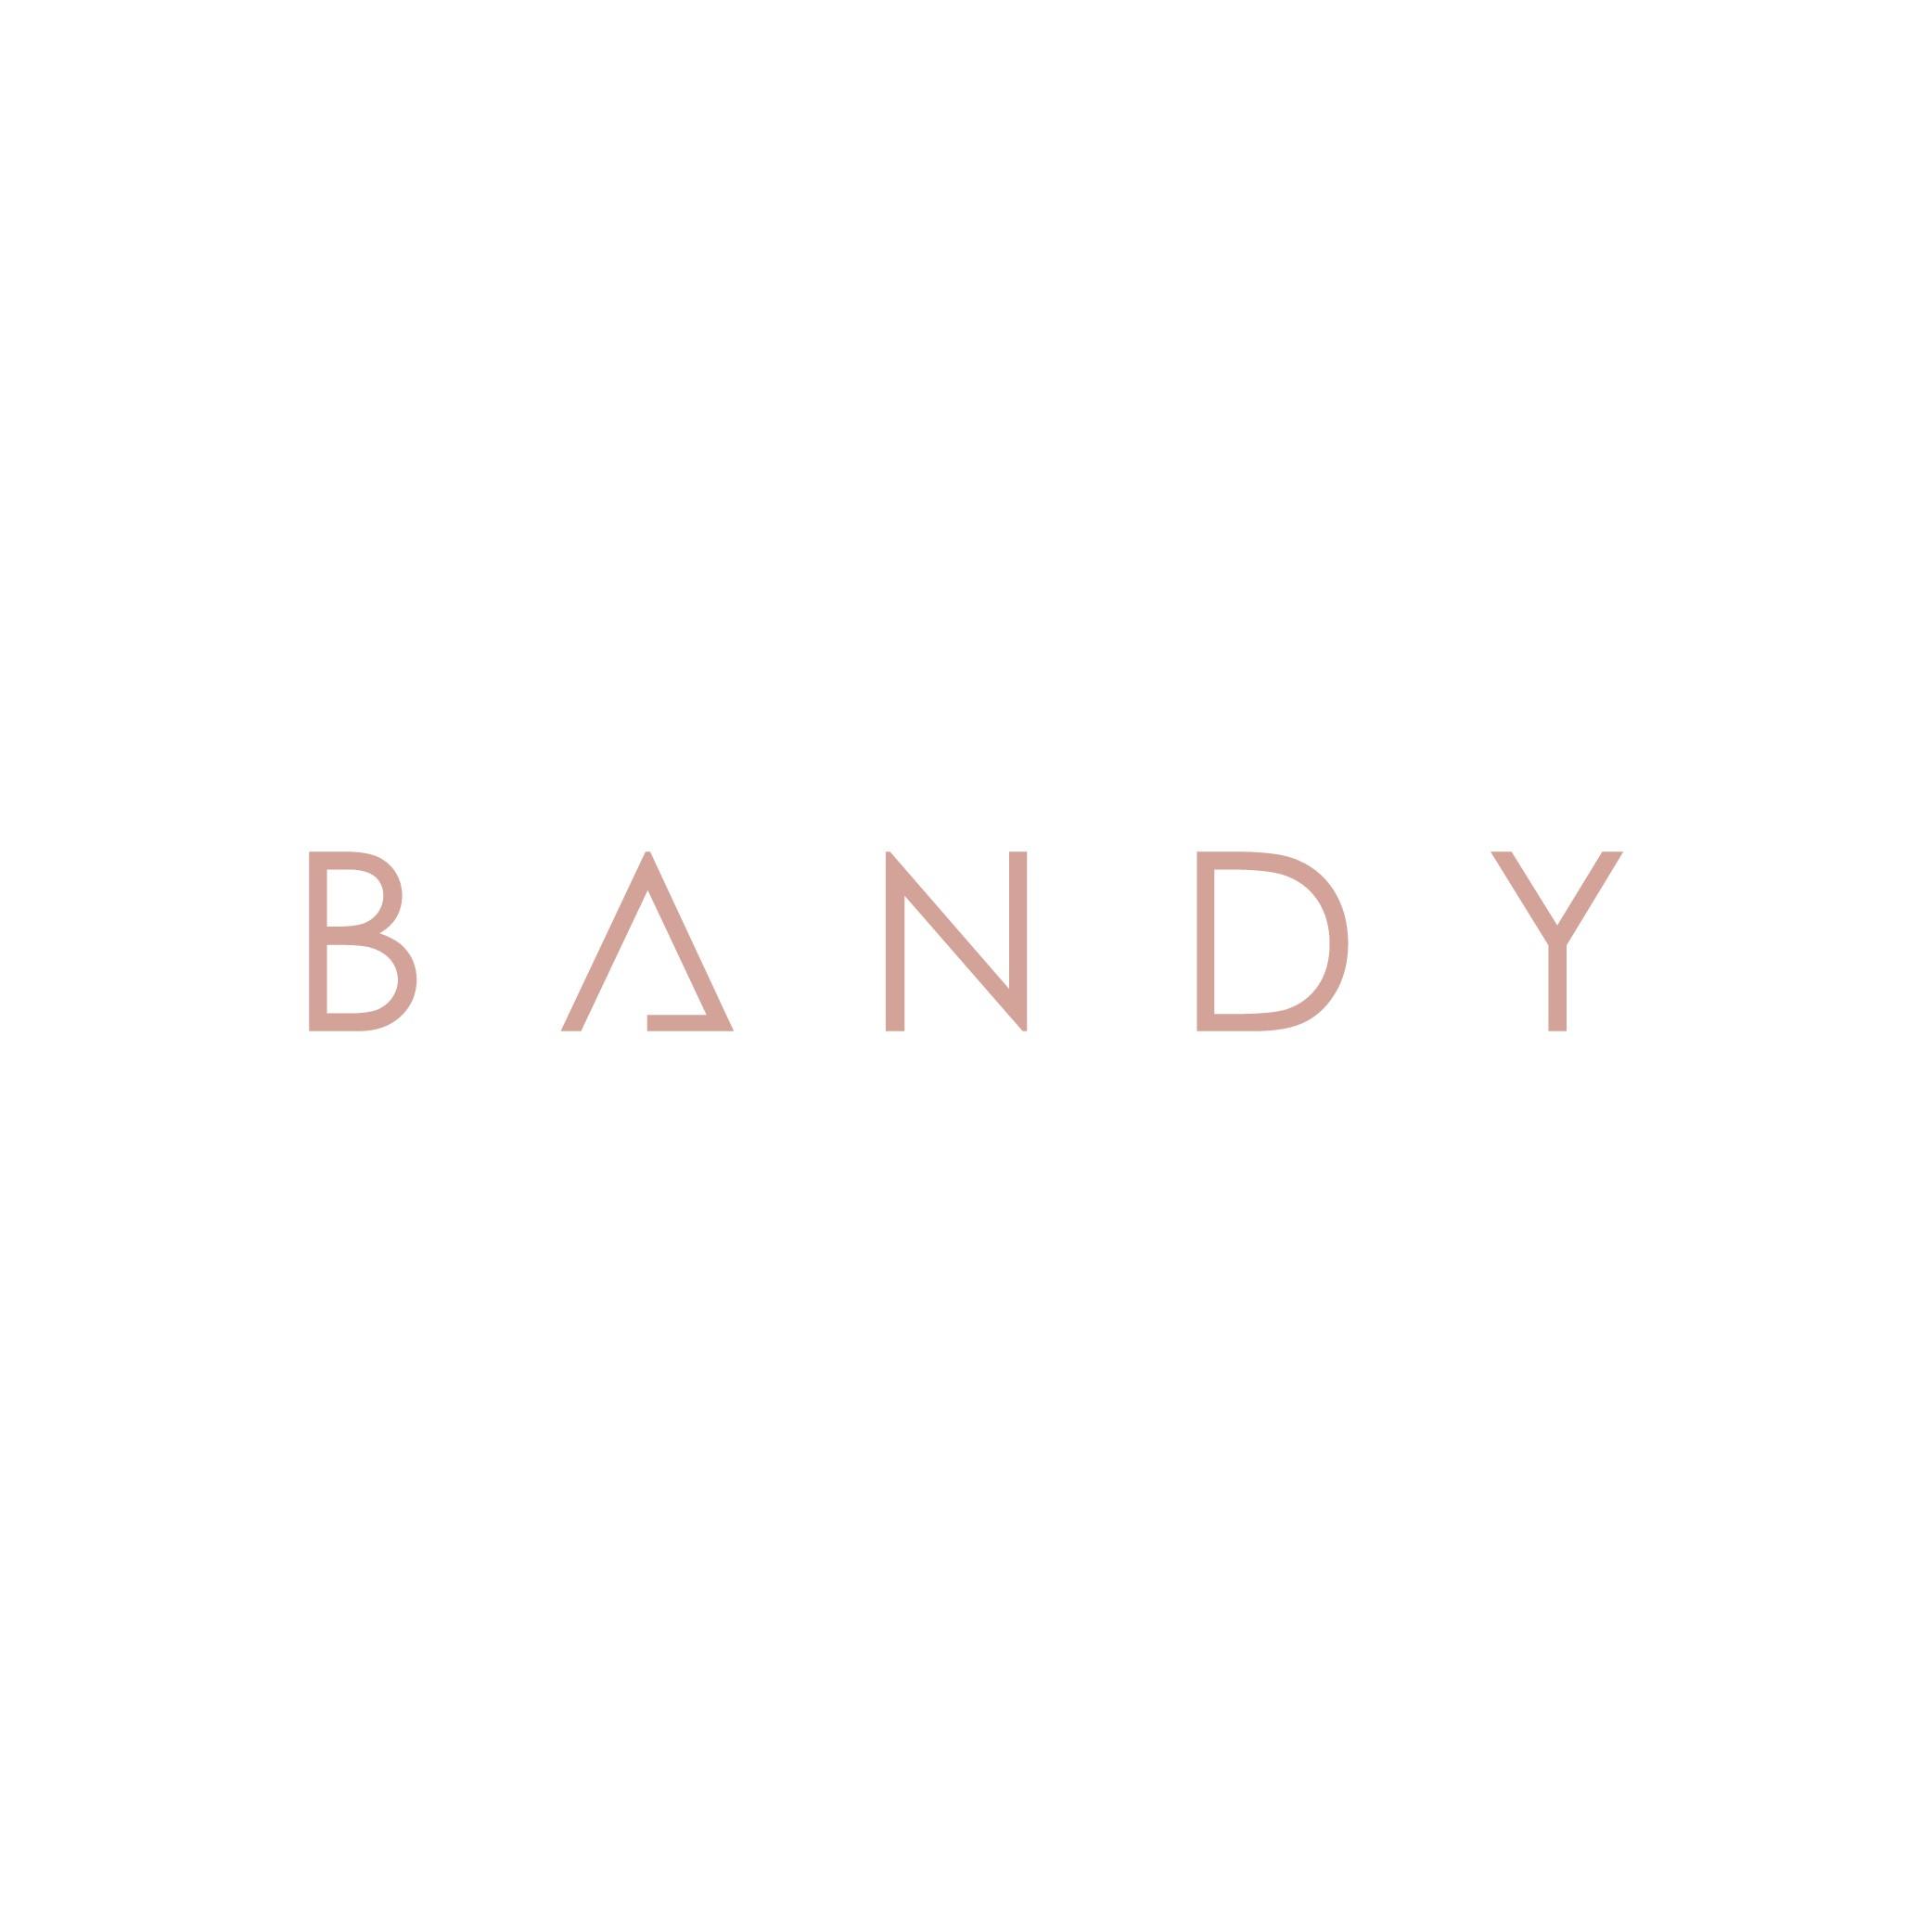 The Bandy Shop